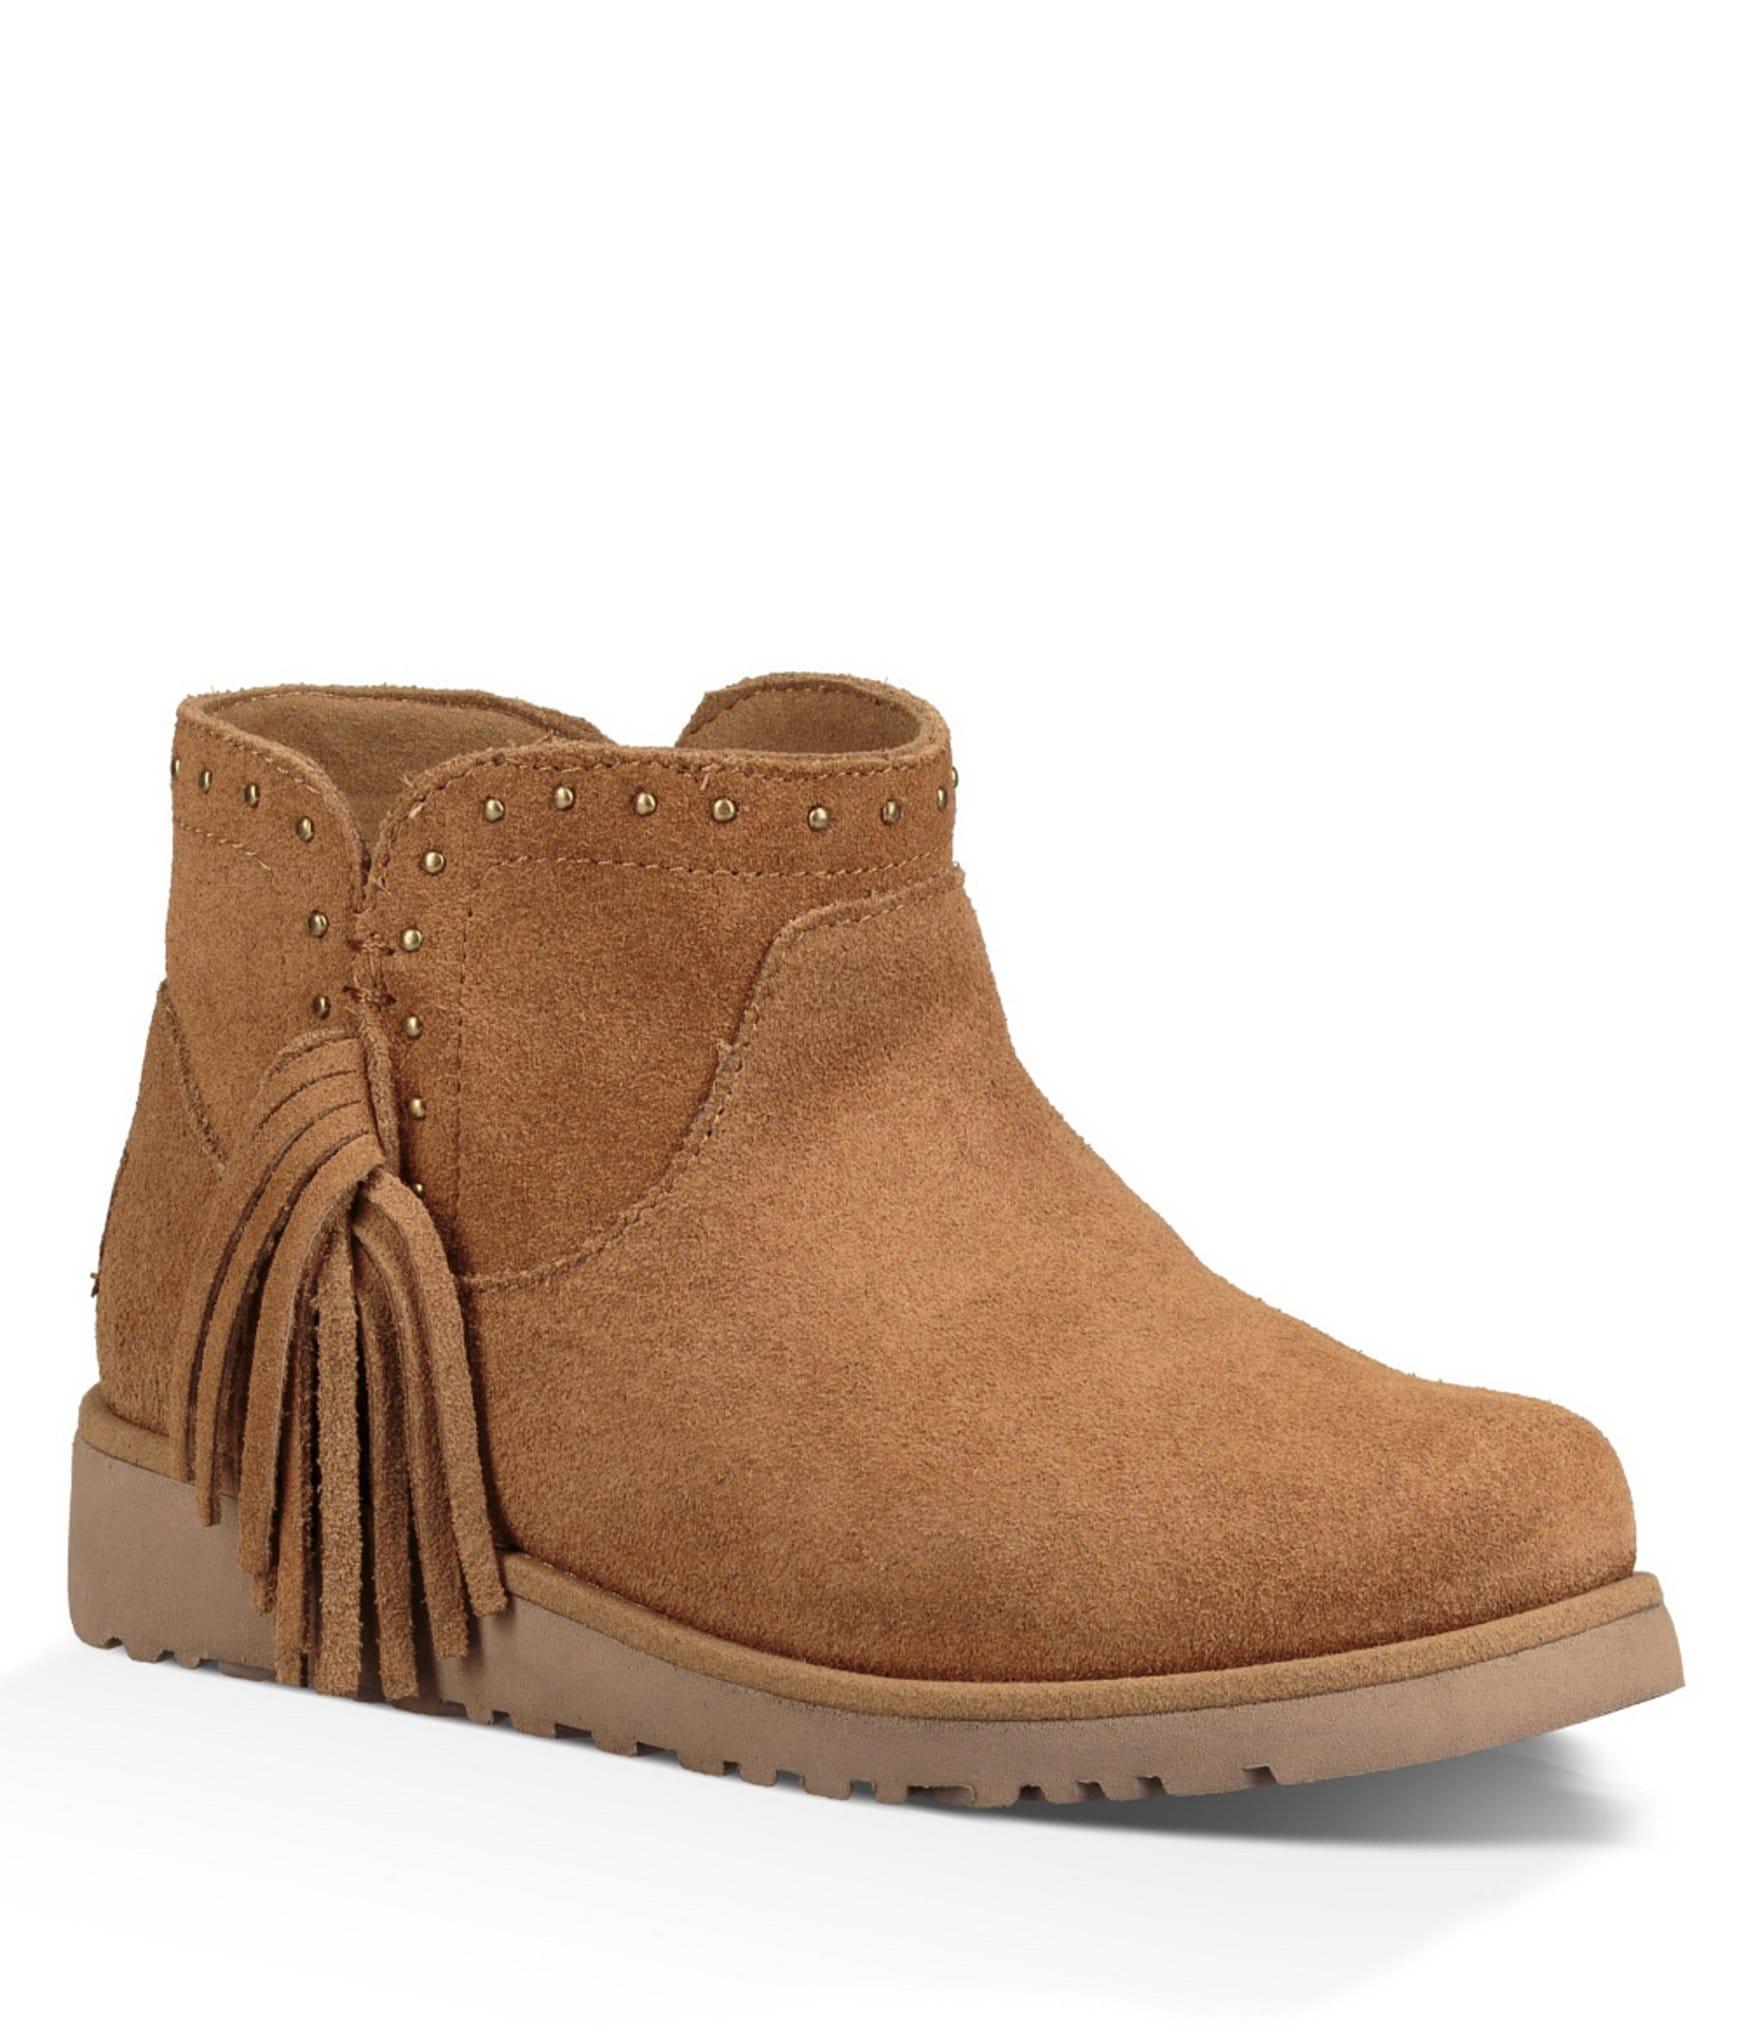 ugg 174 180 boots dillards